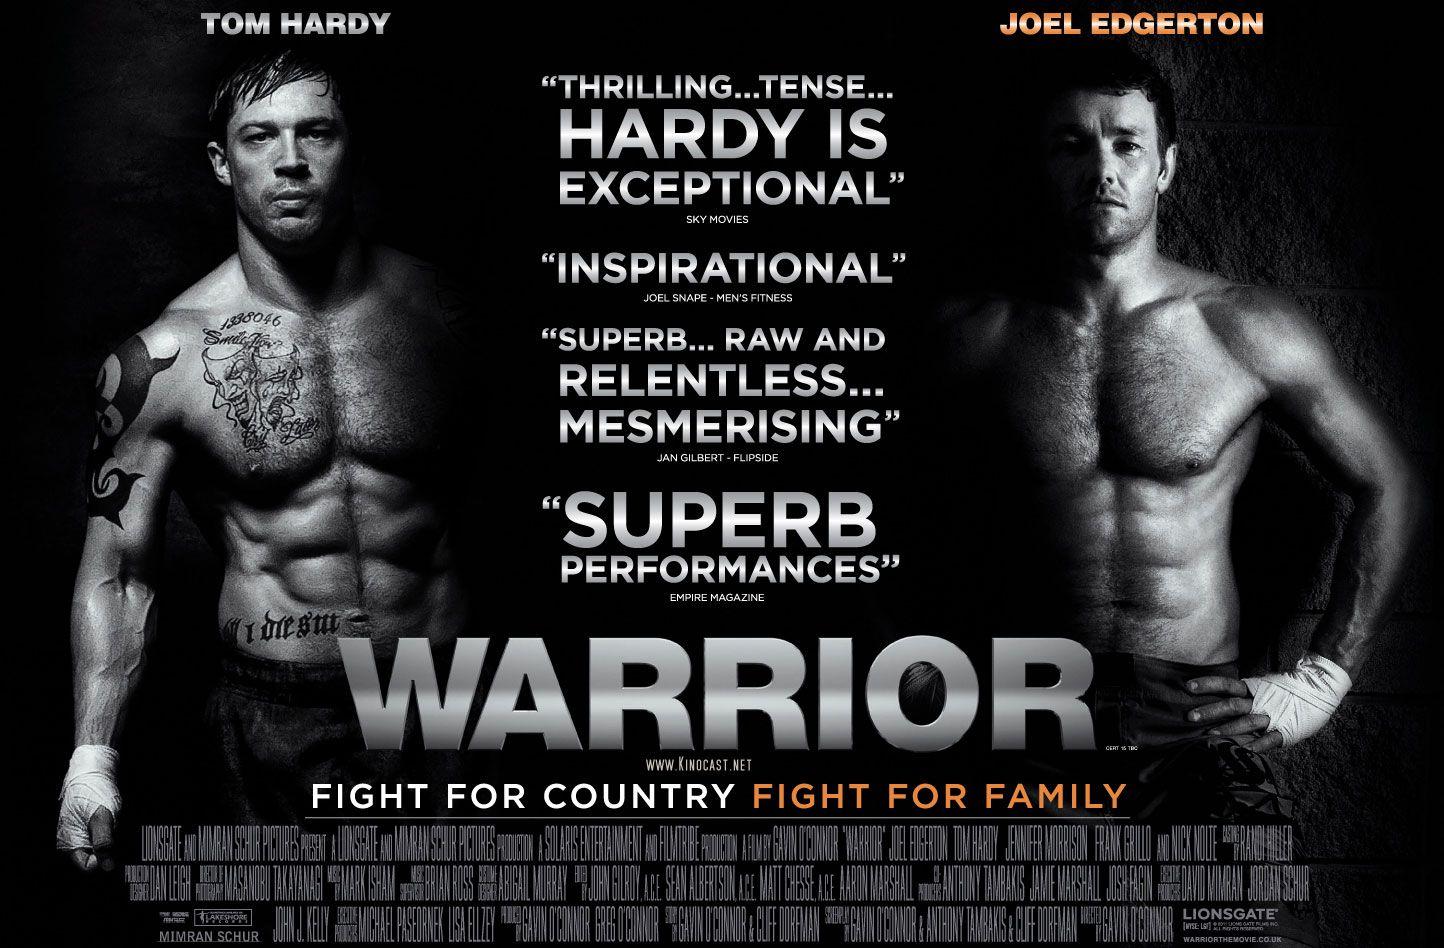 Warrior | Warrior movie, Tom hardy, Sports movie